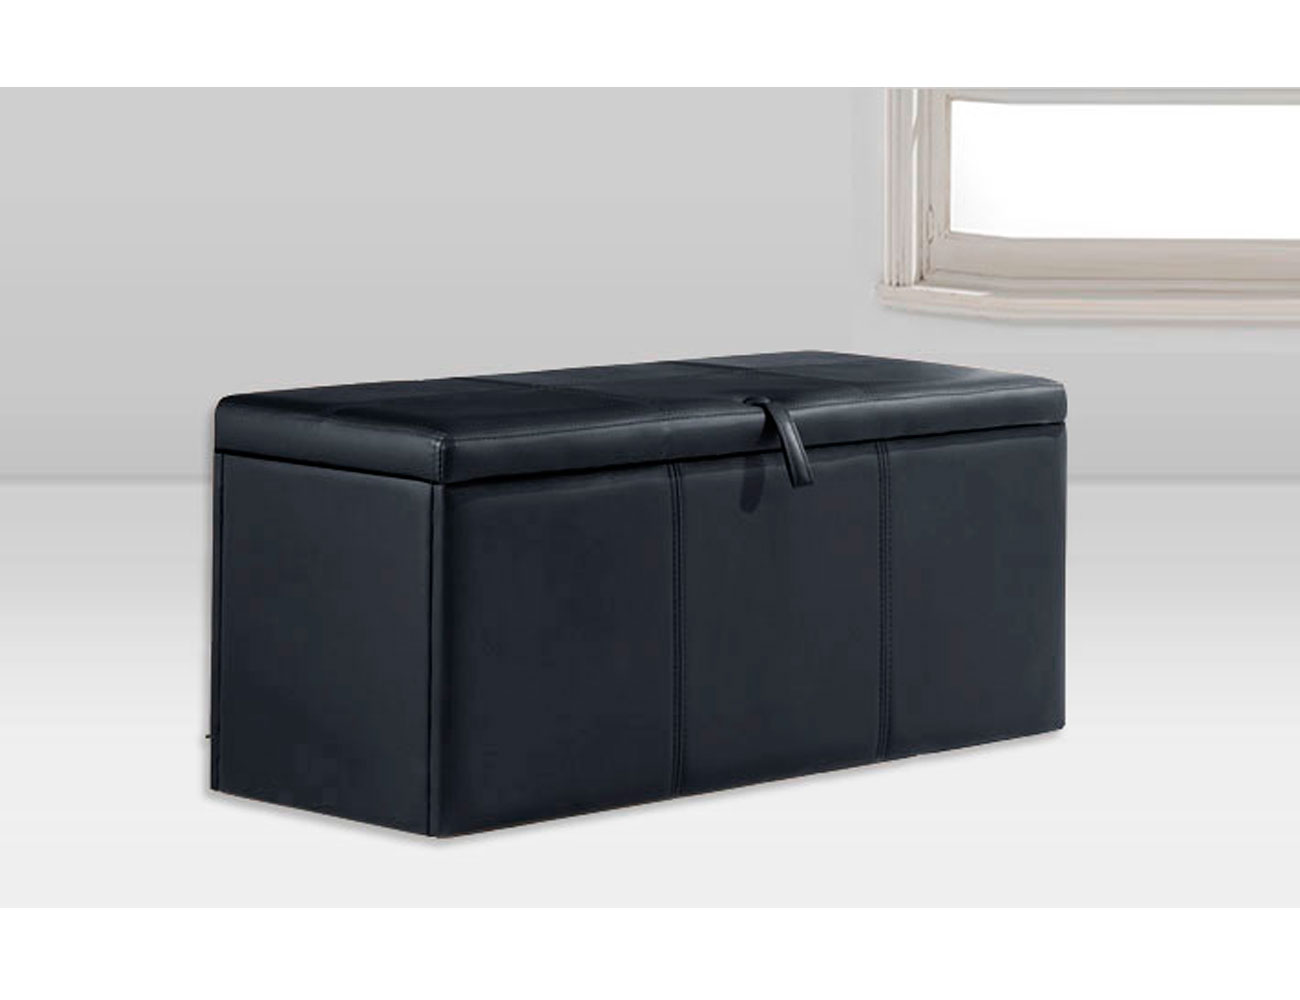 Baul tapizado polipiel negro